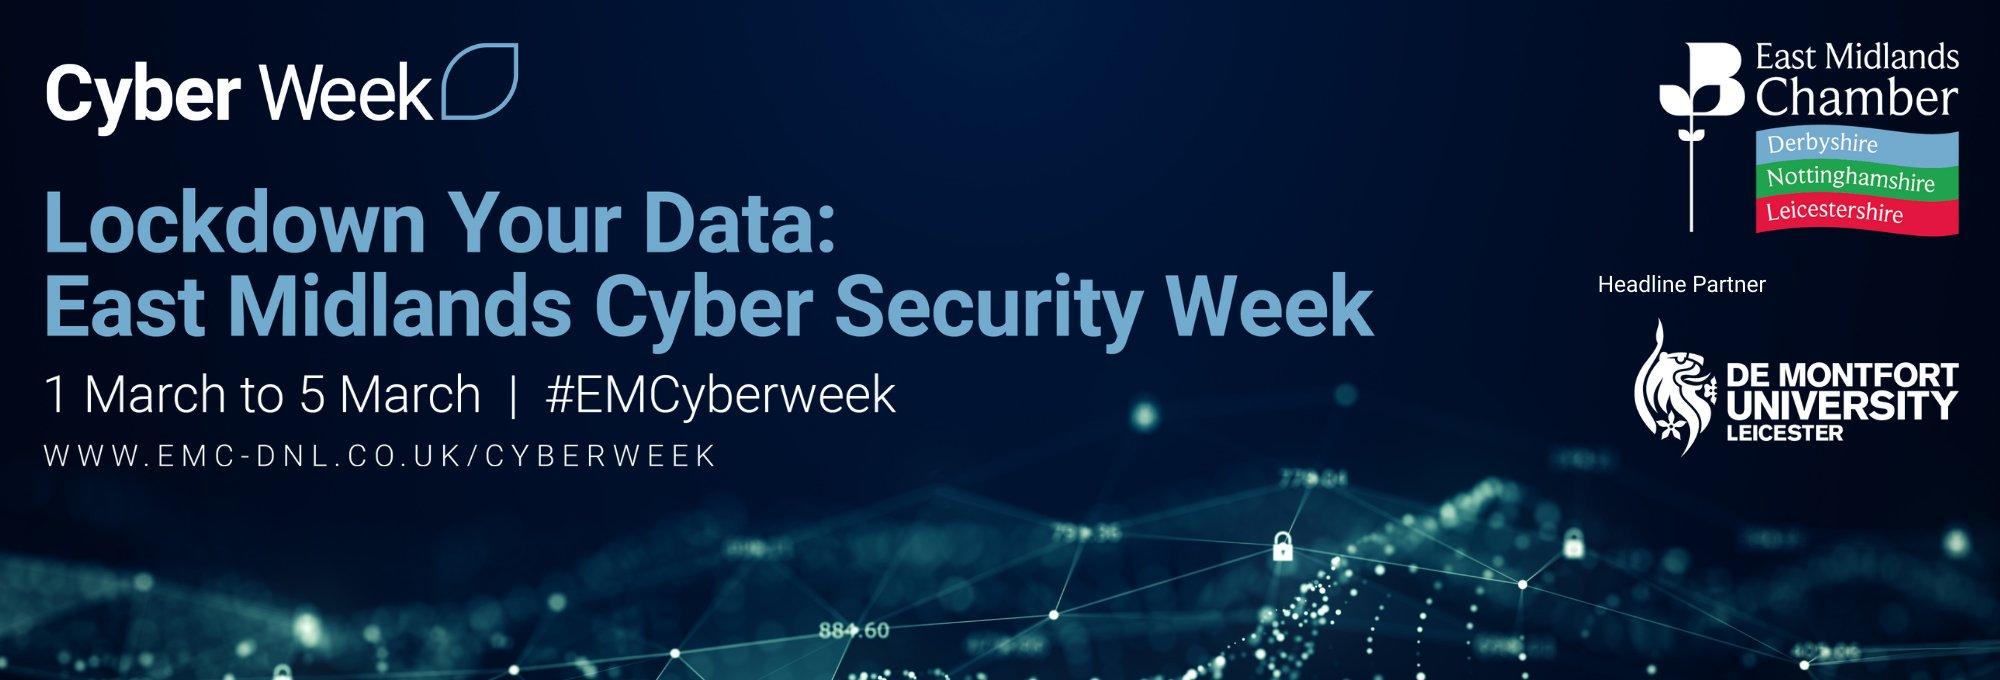 Lockdown Your Data: East Midlands Cyber Security Week